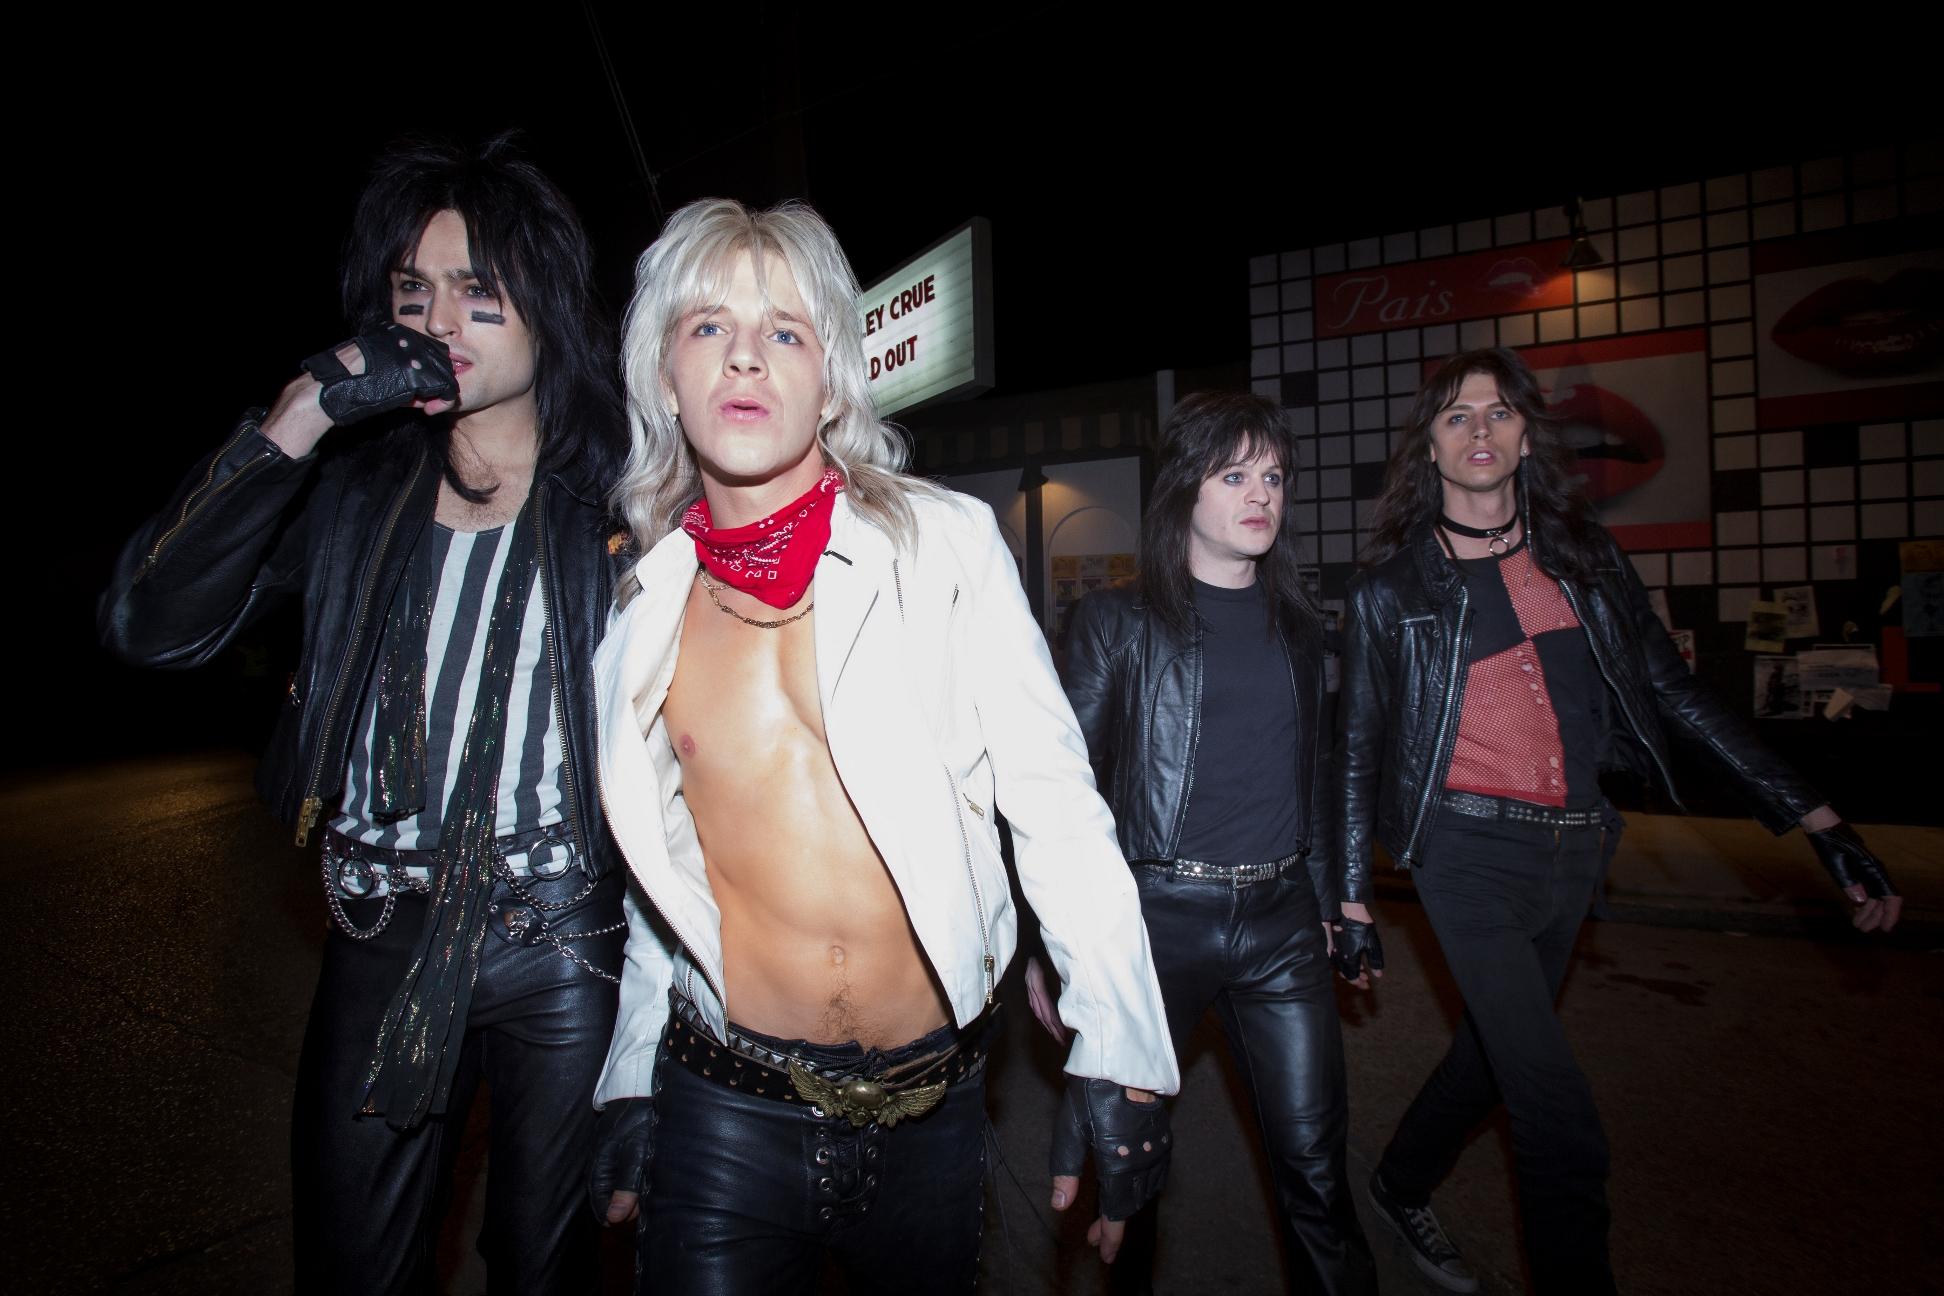 The Dirt: Mötley Crüe, un'immagine del film